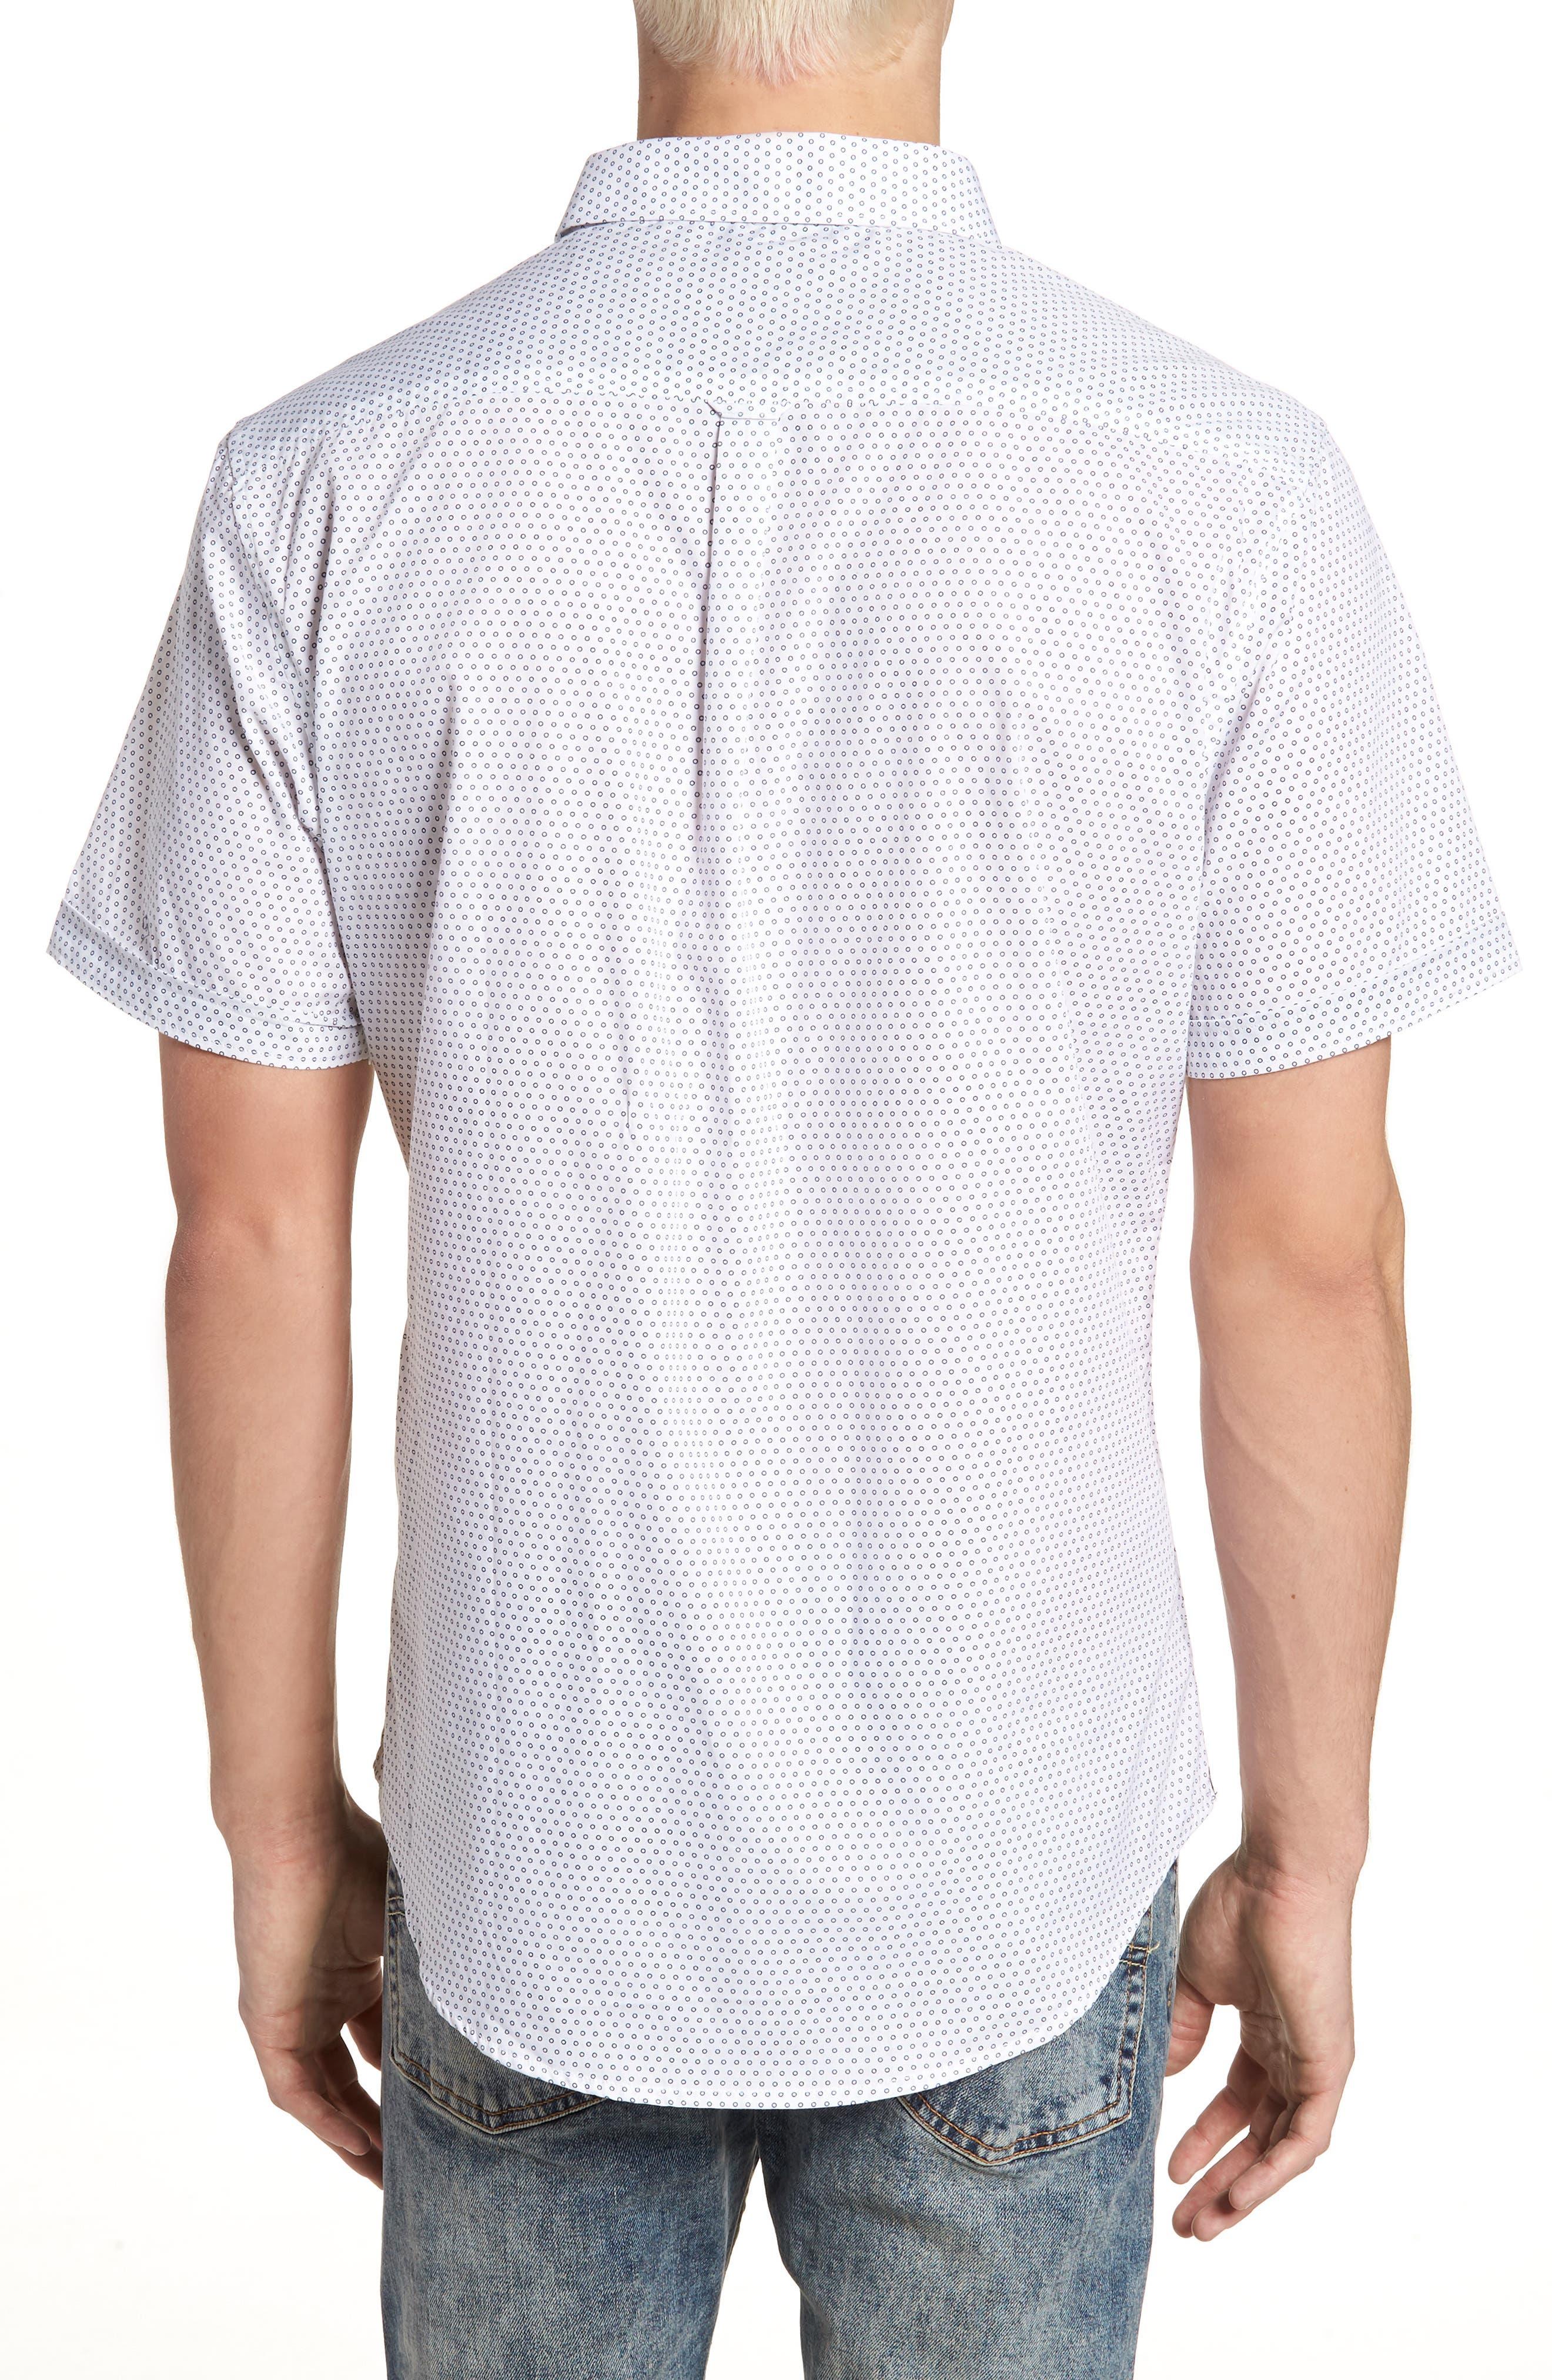 Lights of Home Slim Fit Short Sleeve Sport Shirt,                             Alternate thumbnail 2, color,                             White